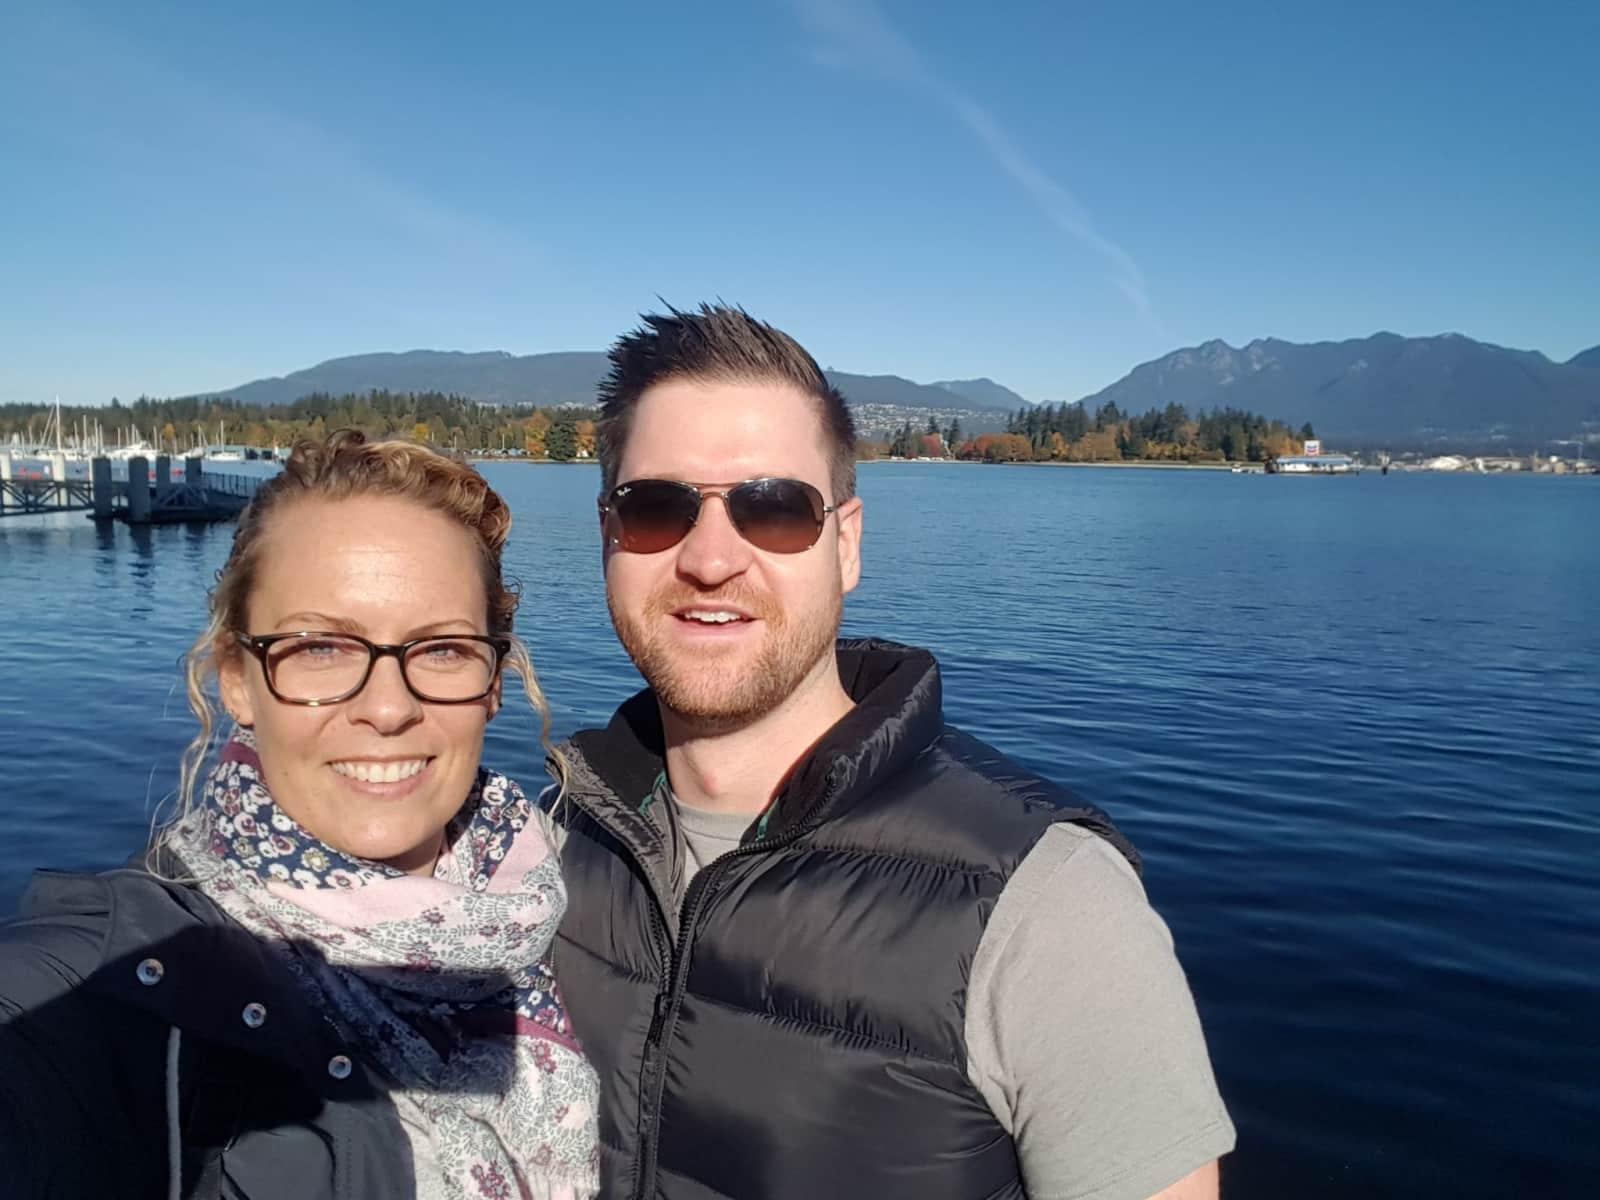 Joanna & Adam from Vancouver, British Columbia, Canada